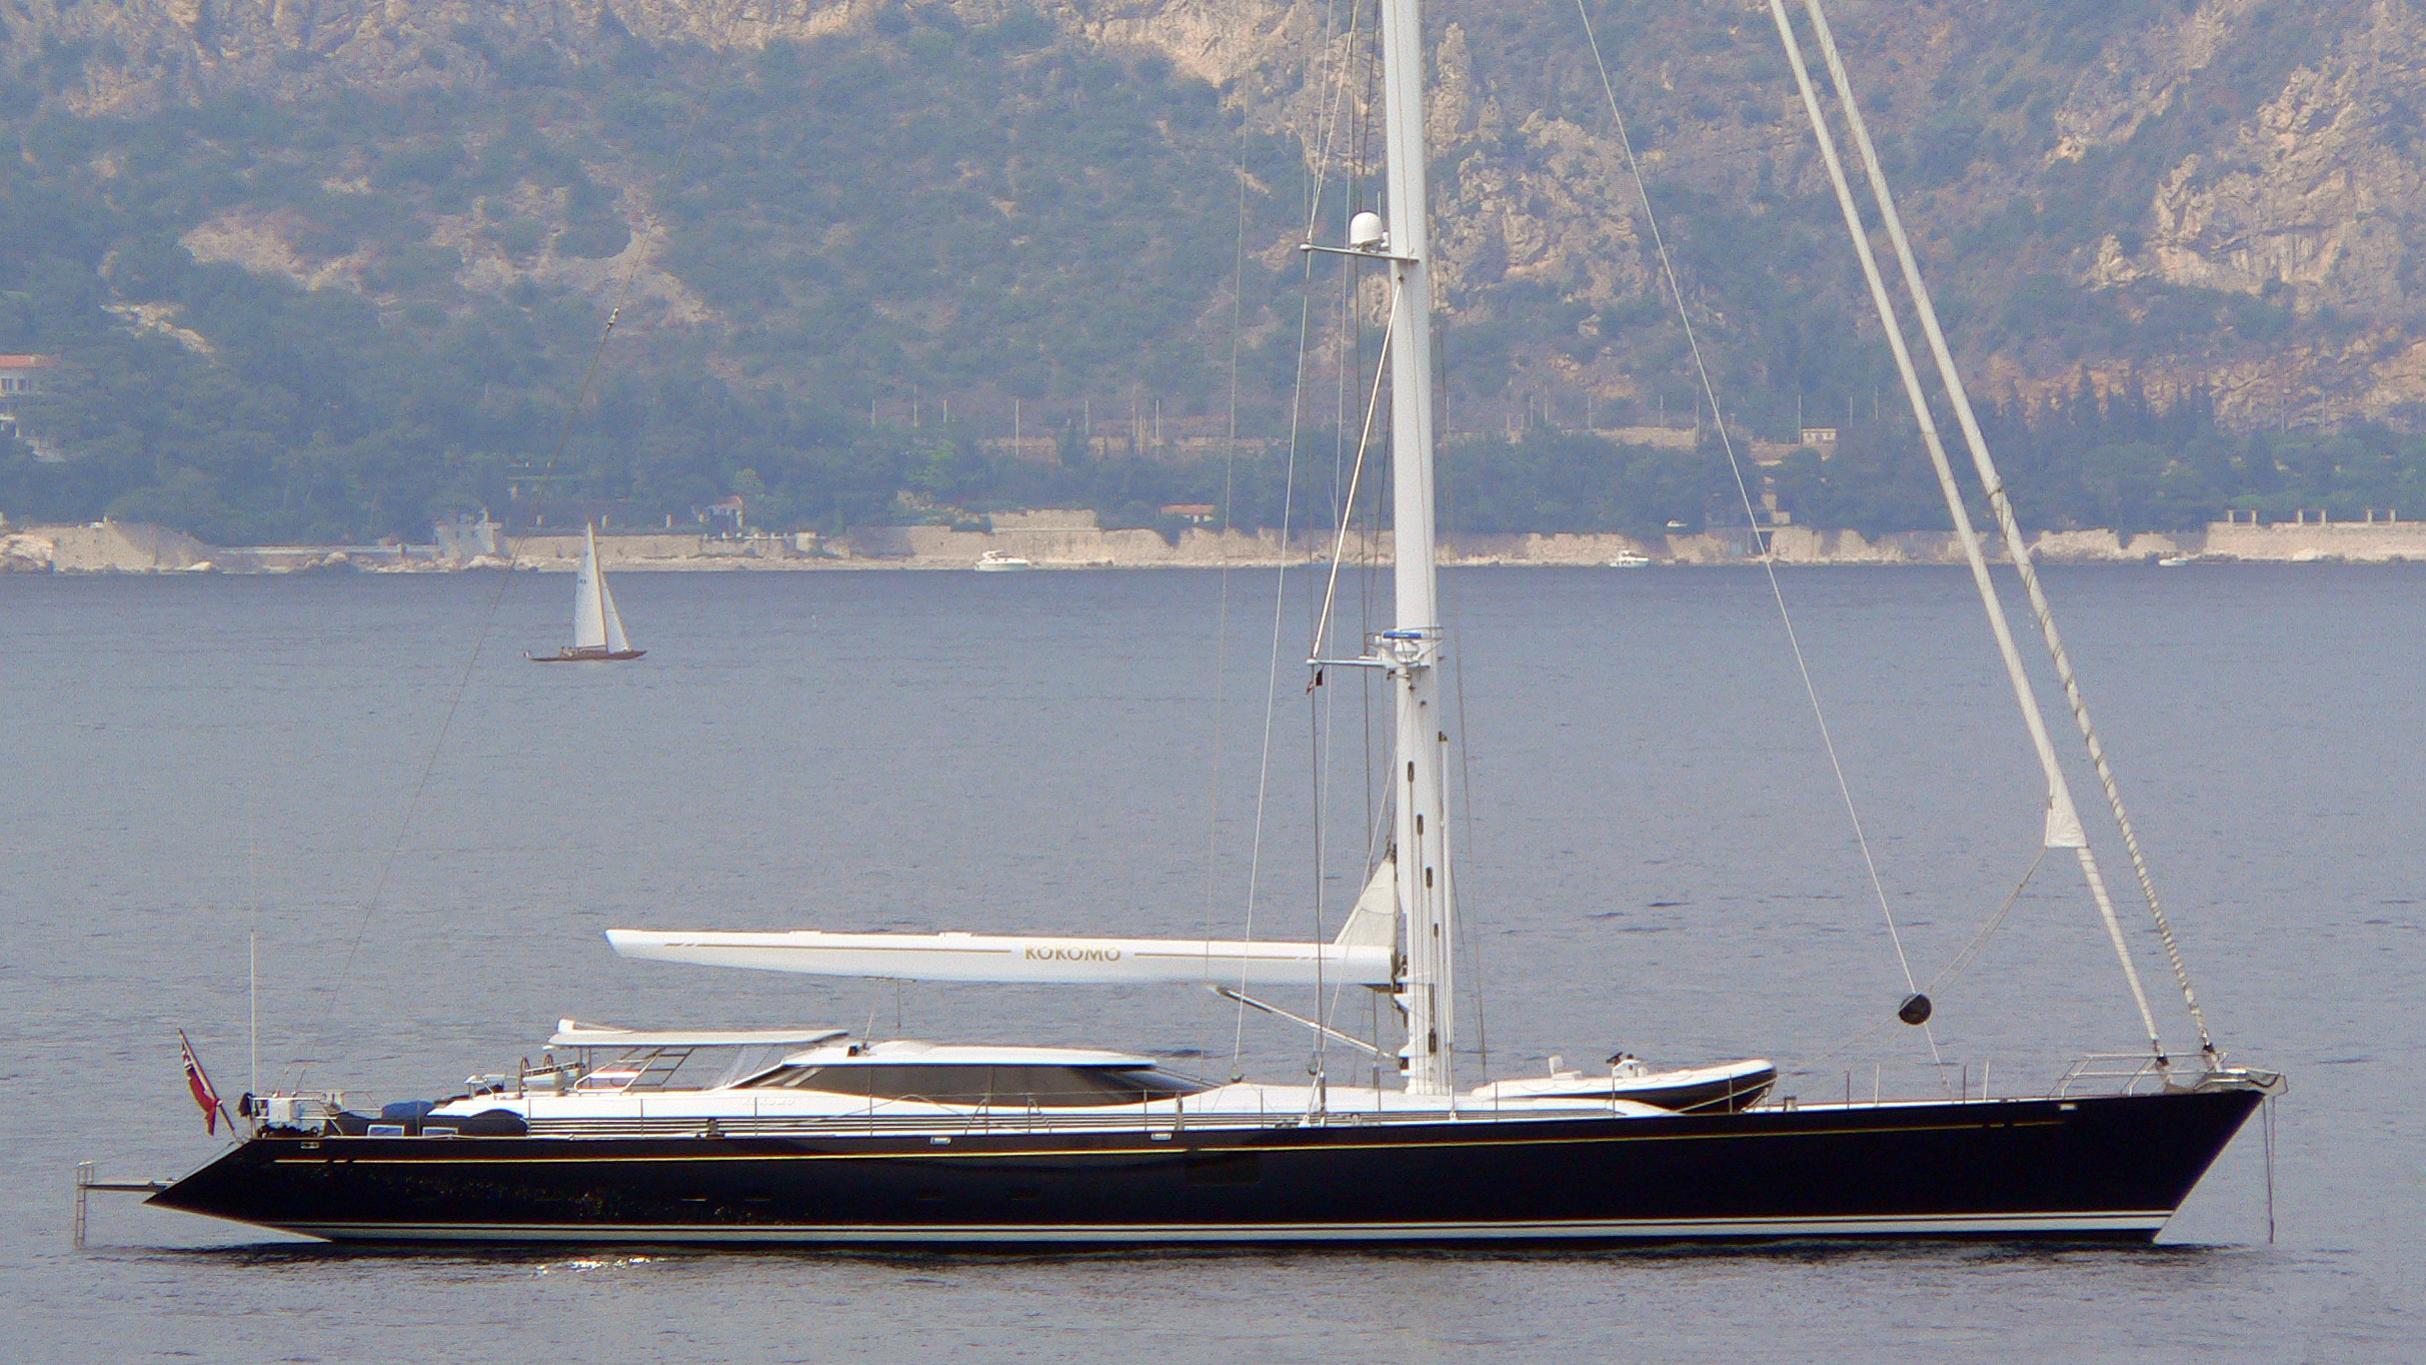 zalmon-nuberu-blau-yacht-exterior